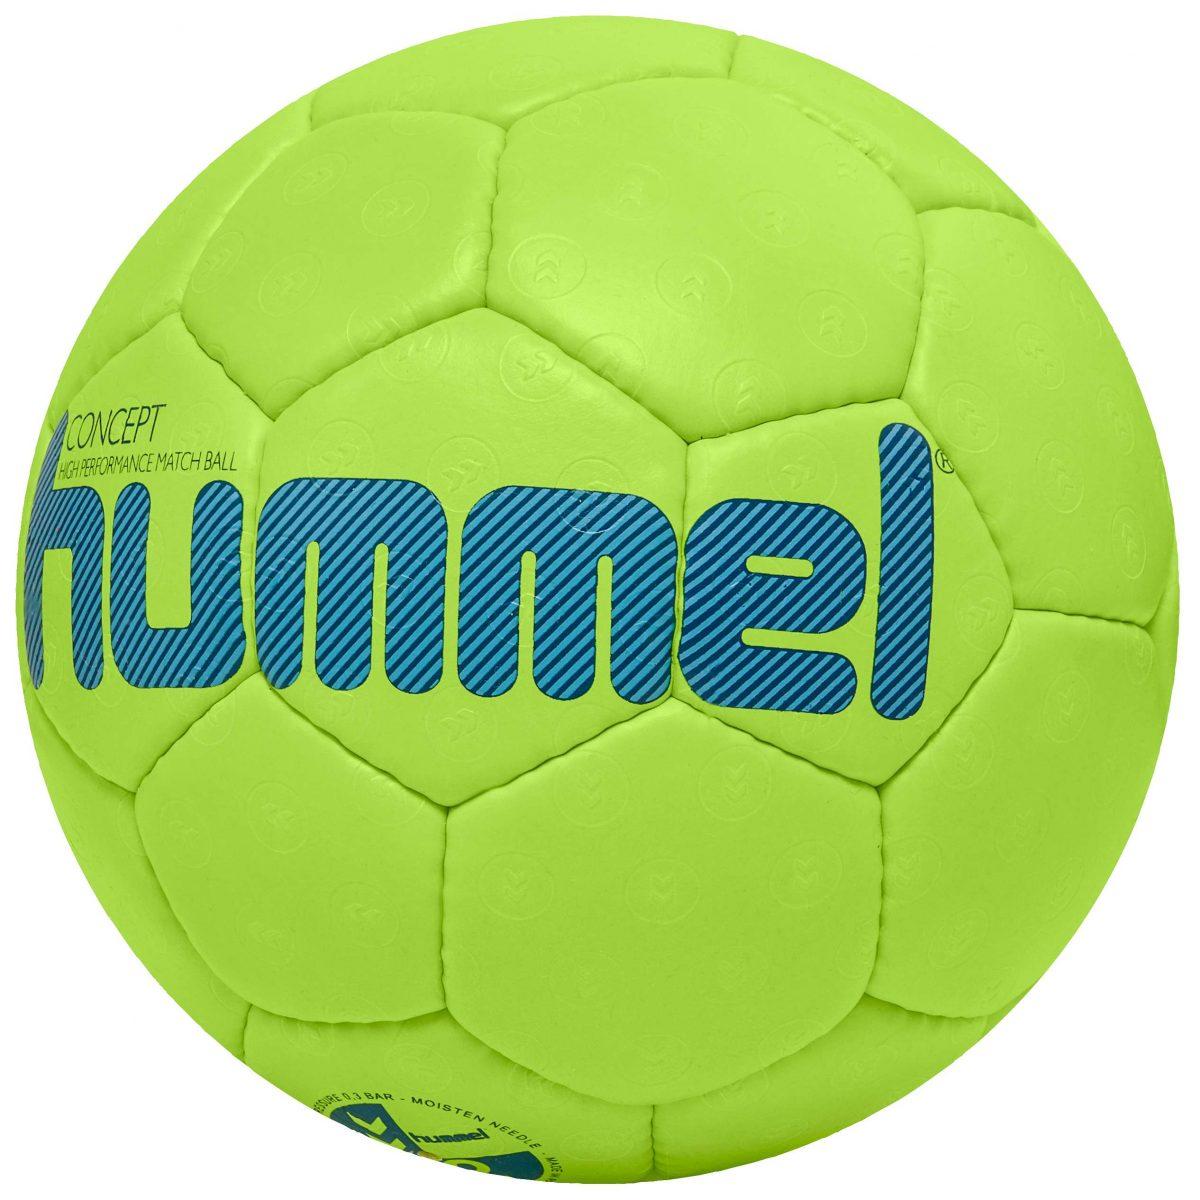 "Hummel Handball ""Concept"""